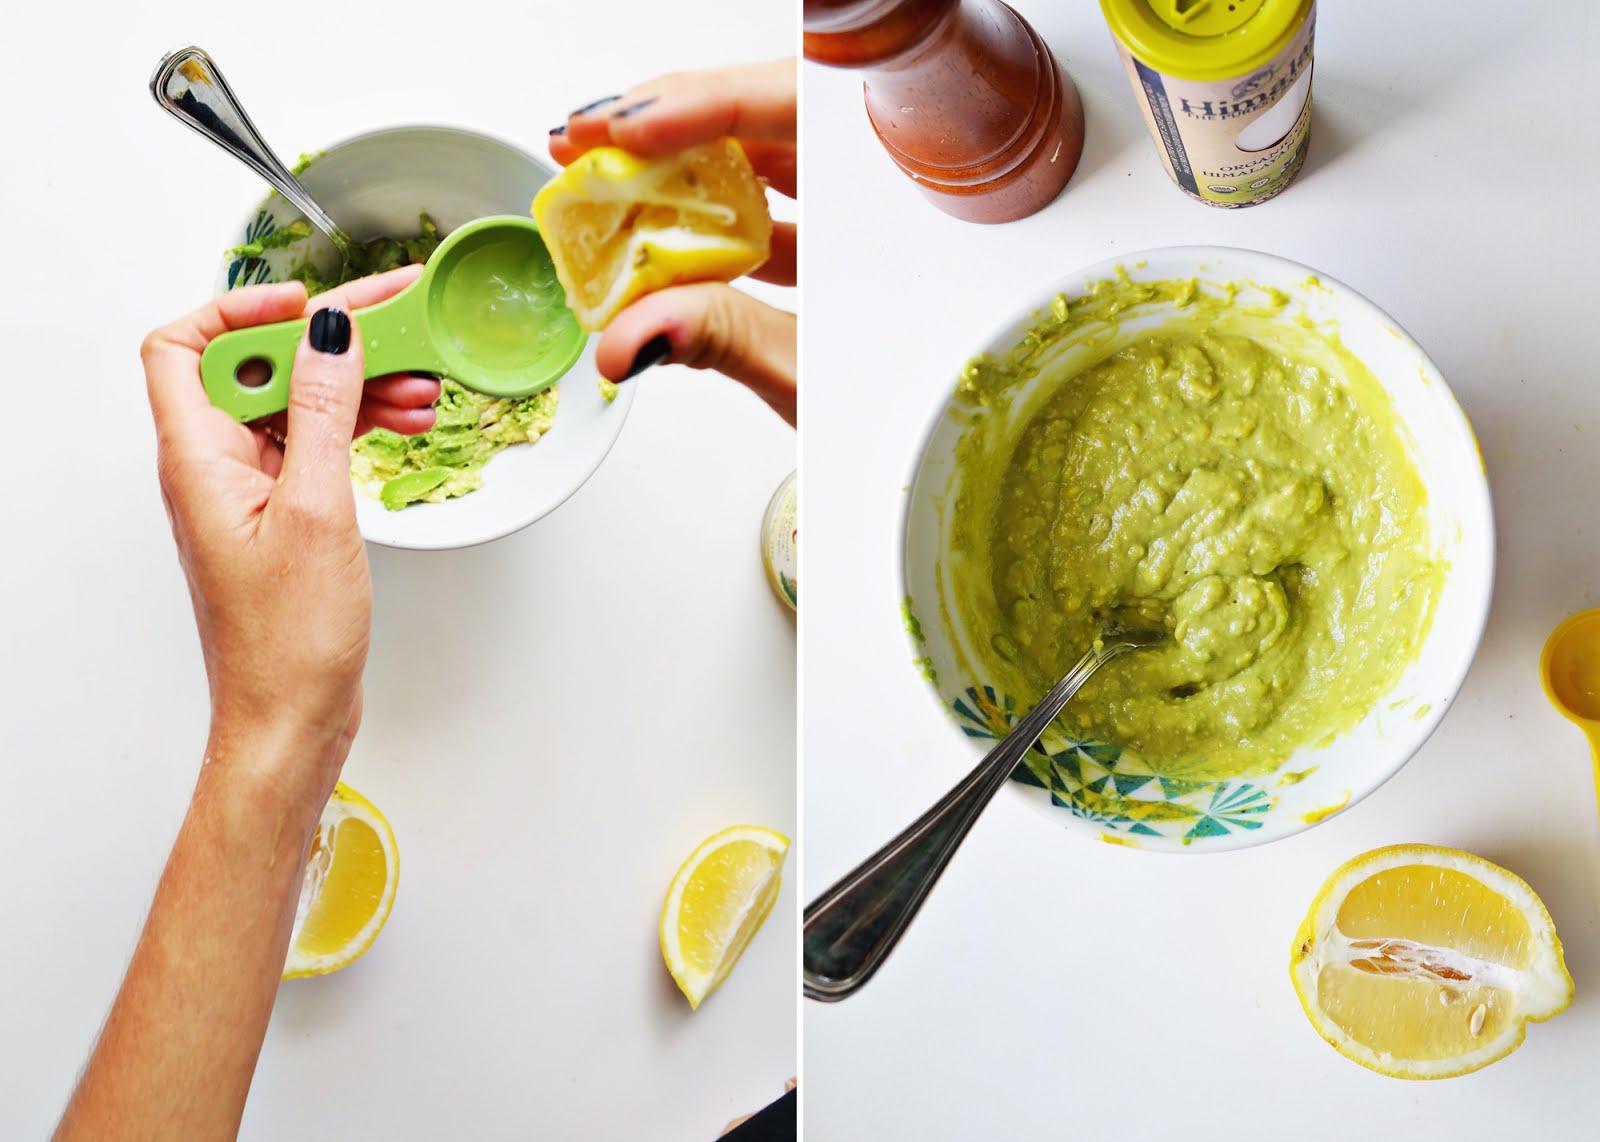 Complete Balanced Meal Recipe Kale Quinoa Salad